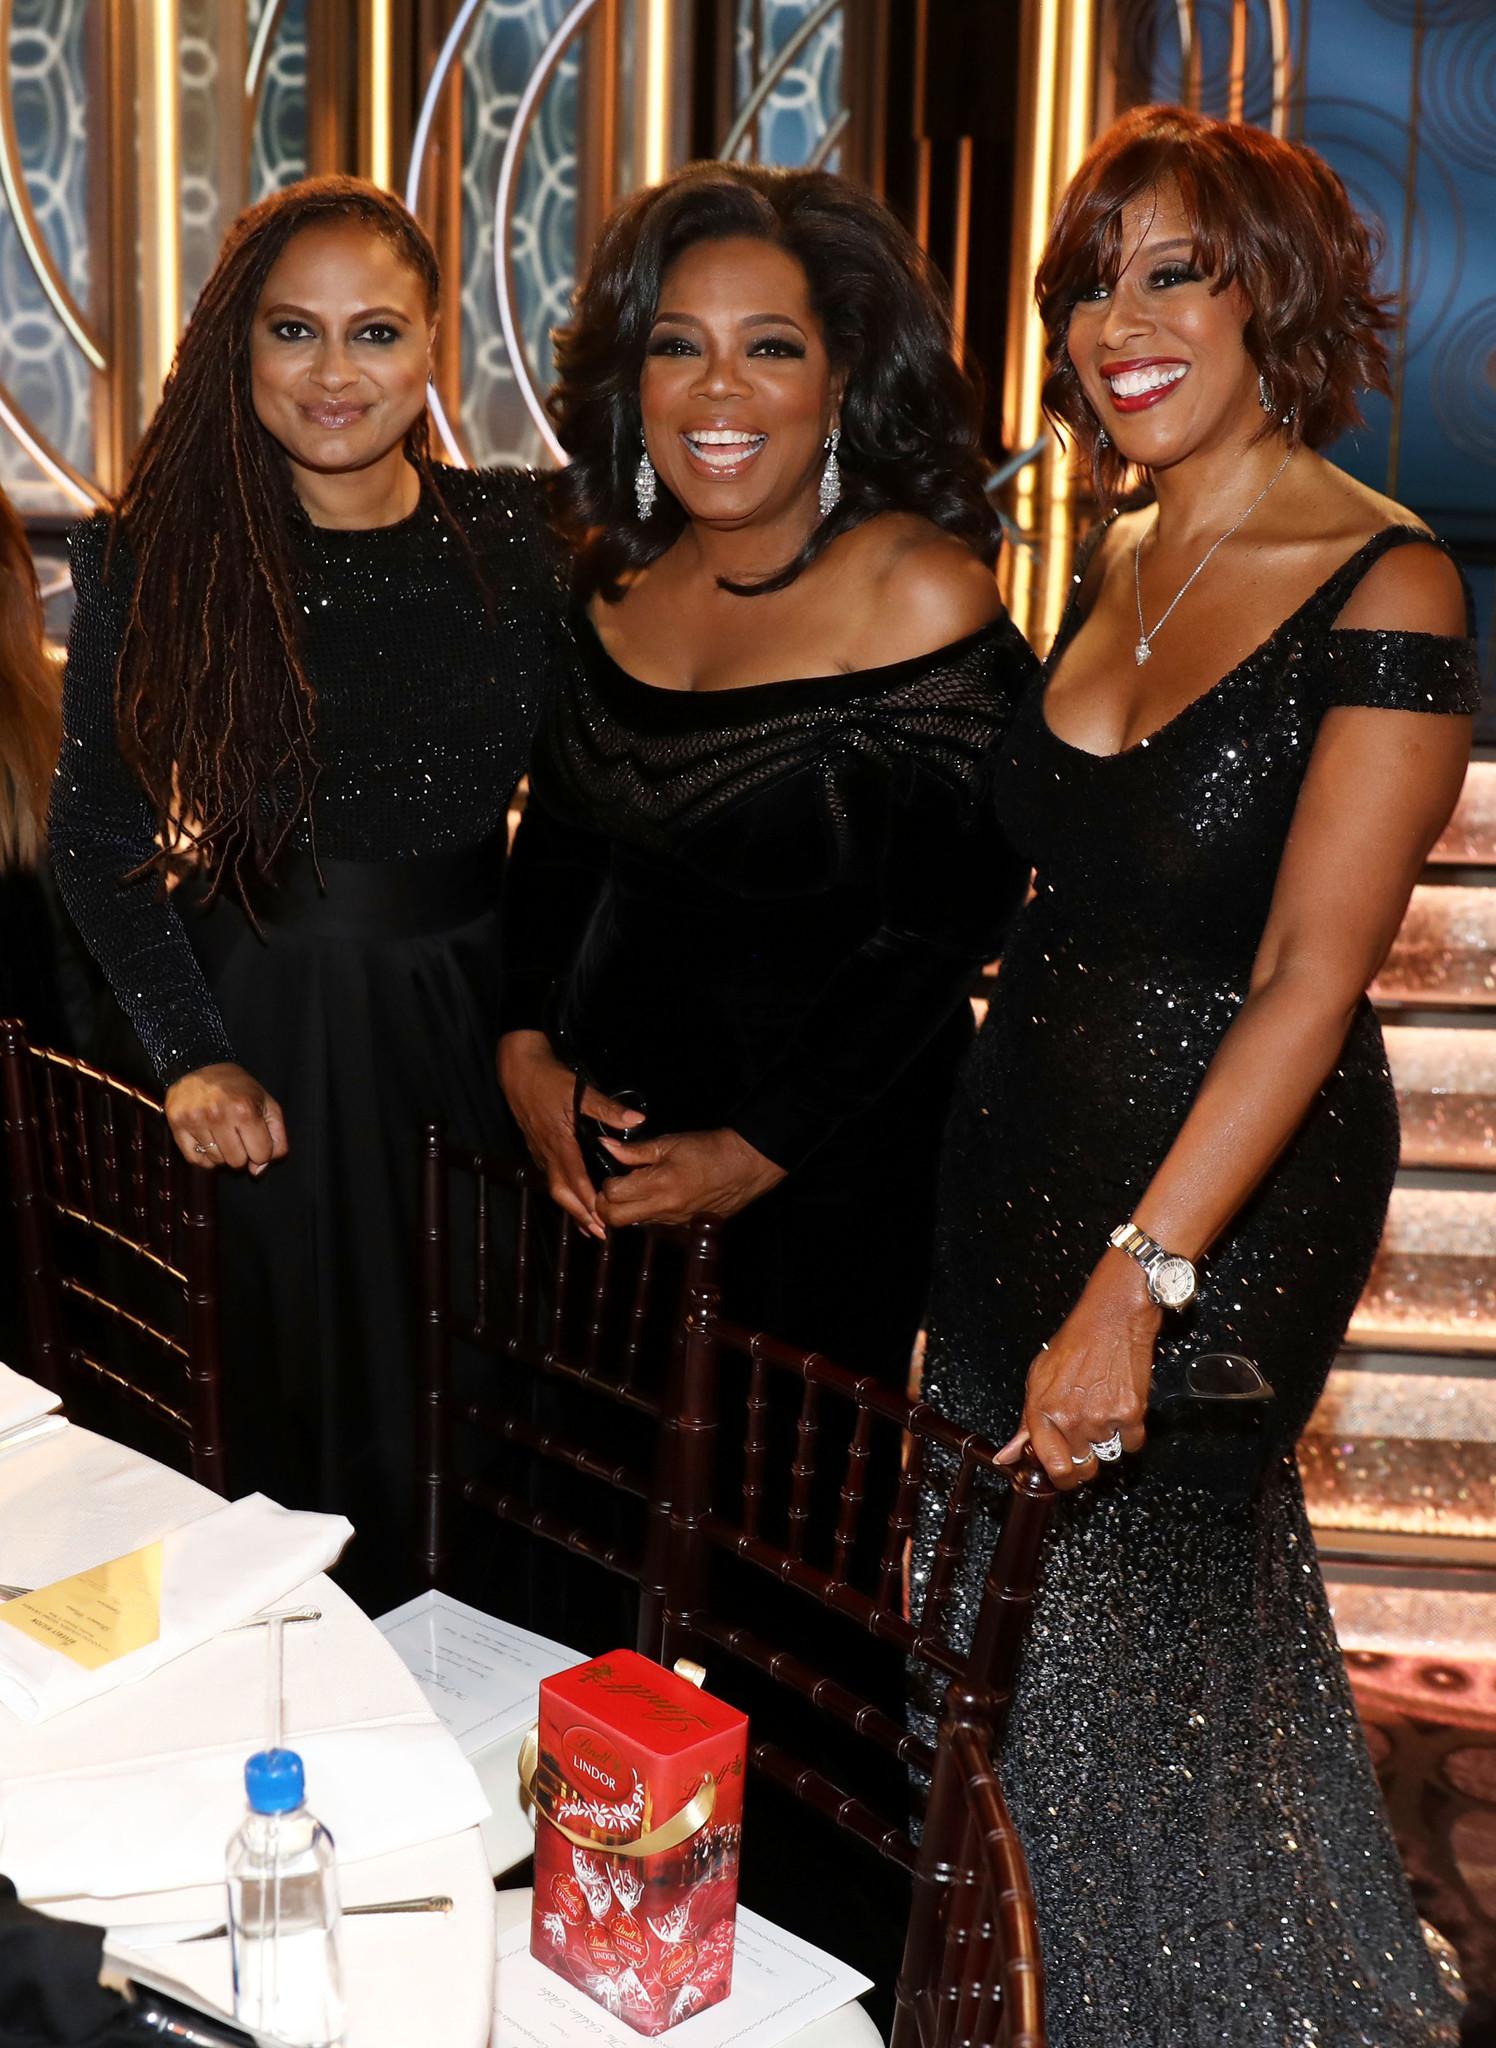 Ava DuVernay, Oprah Winfrey, Gayle King